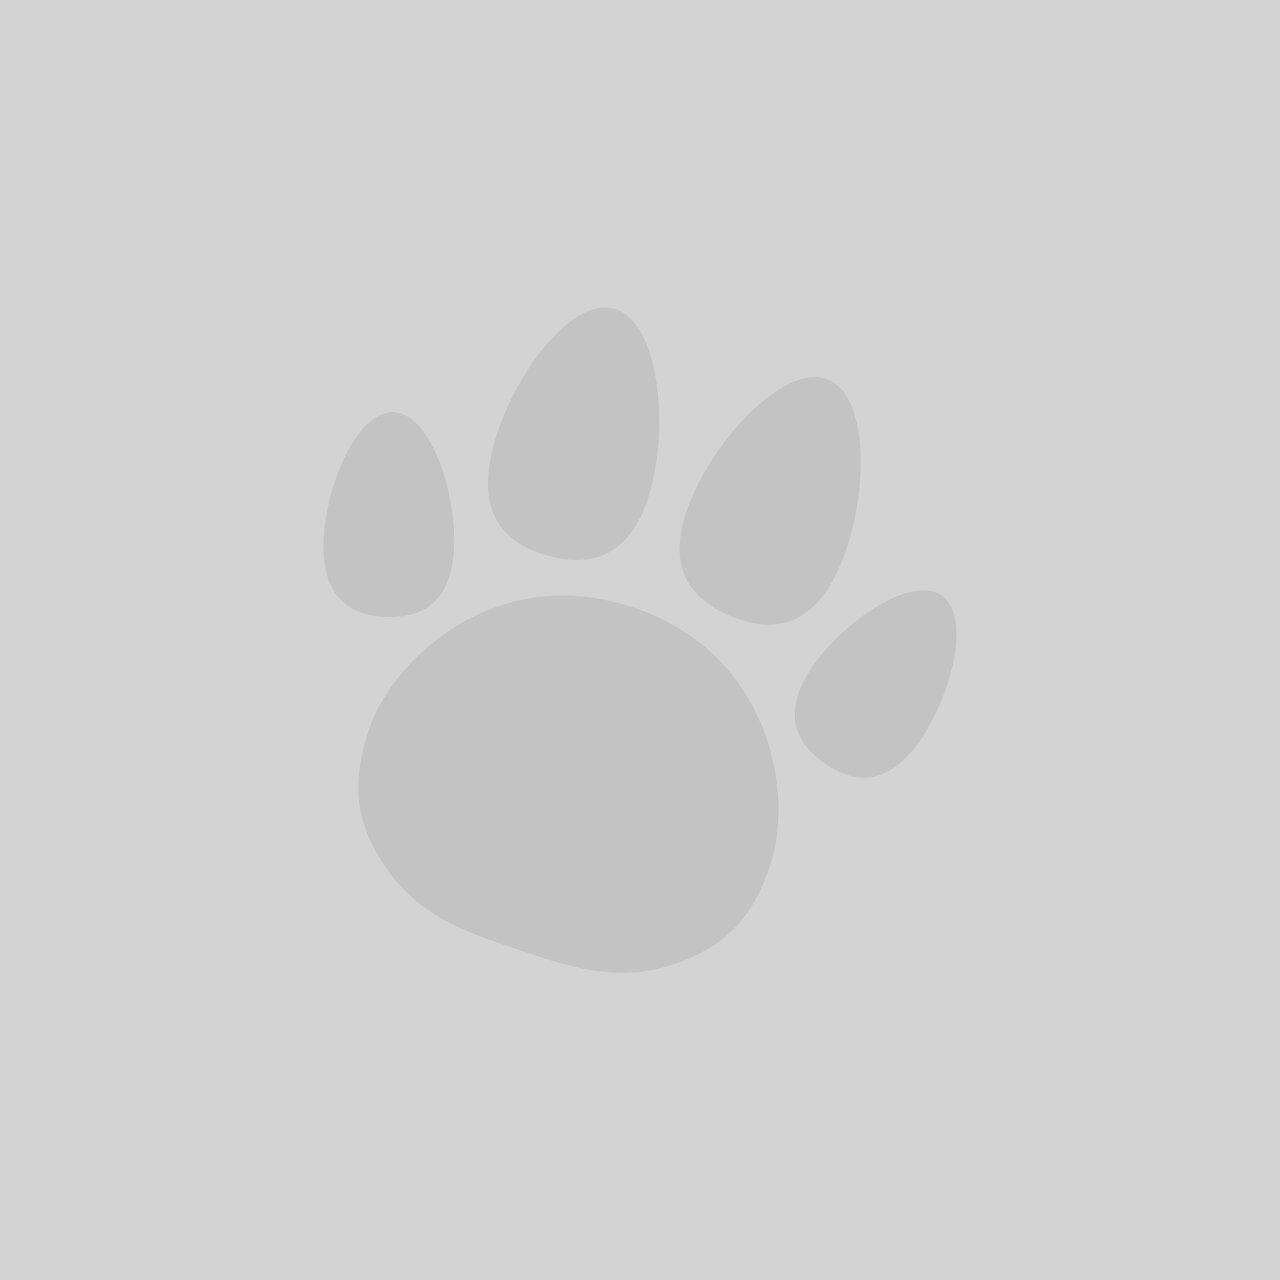 Greenies Petite Dental Dog Treats 85g